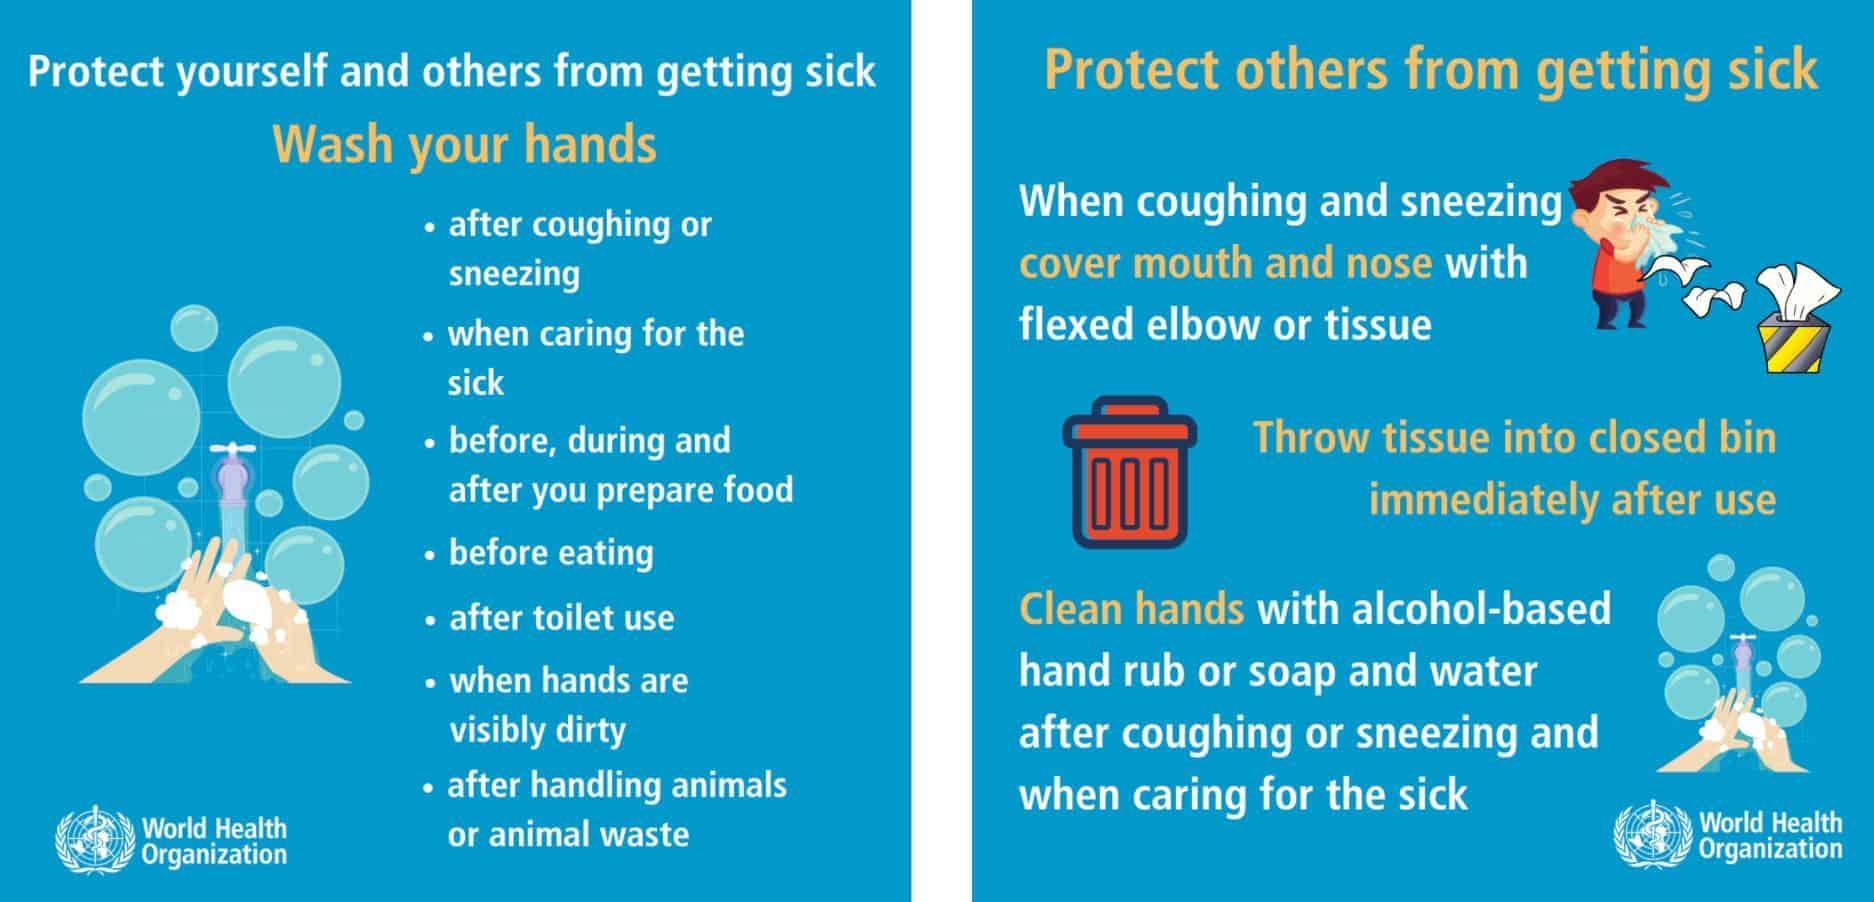 Best Practices to Prevent Spreading Illnesses